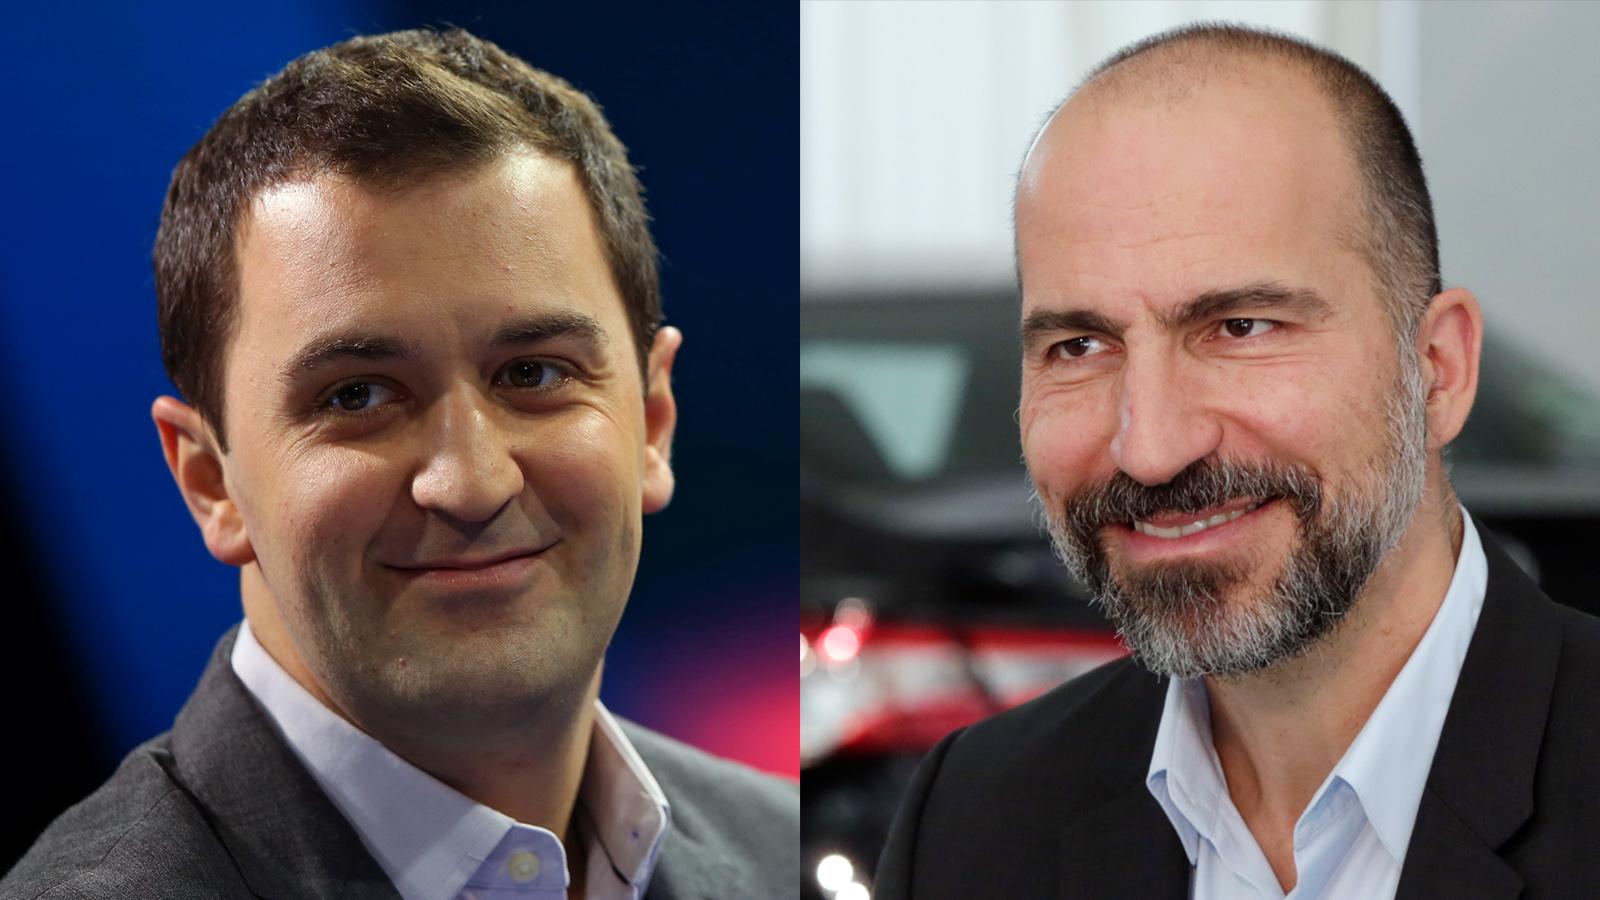 Lyft president John Zimmer and Uber CEO Dara Khosrowshahi